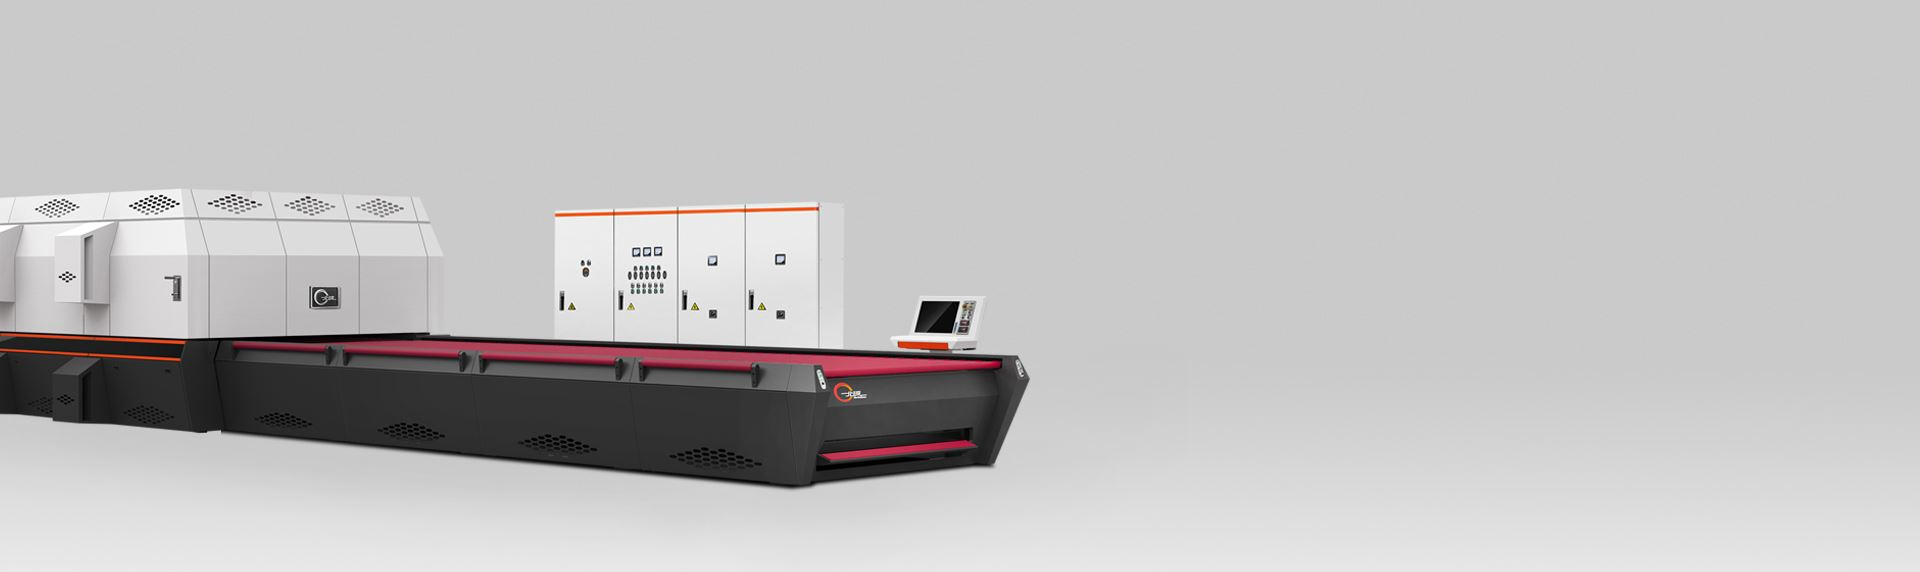 SSC设计-A系列高端钢化炉